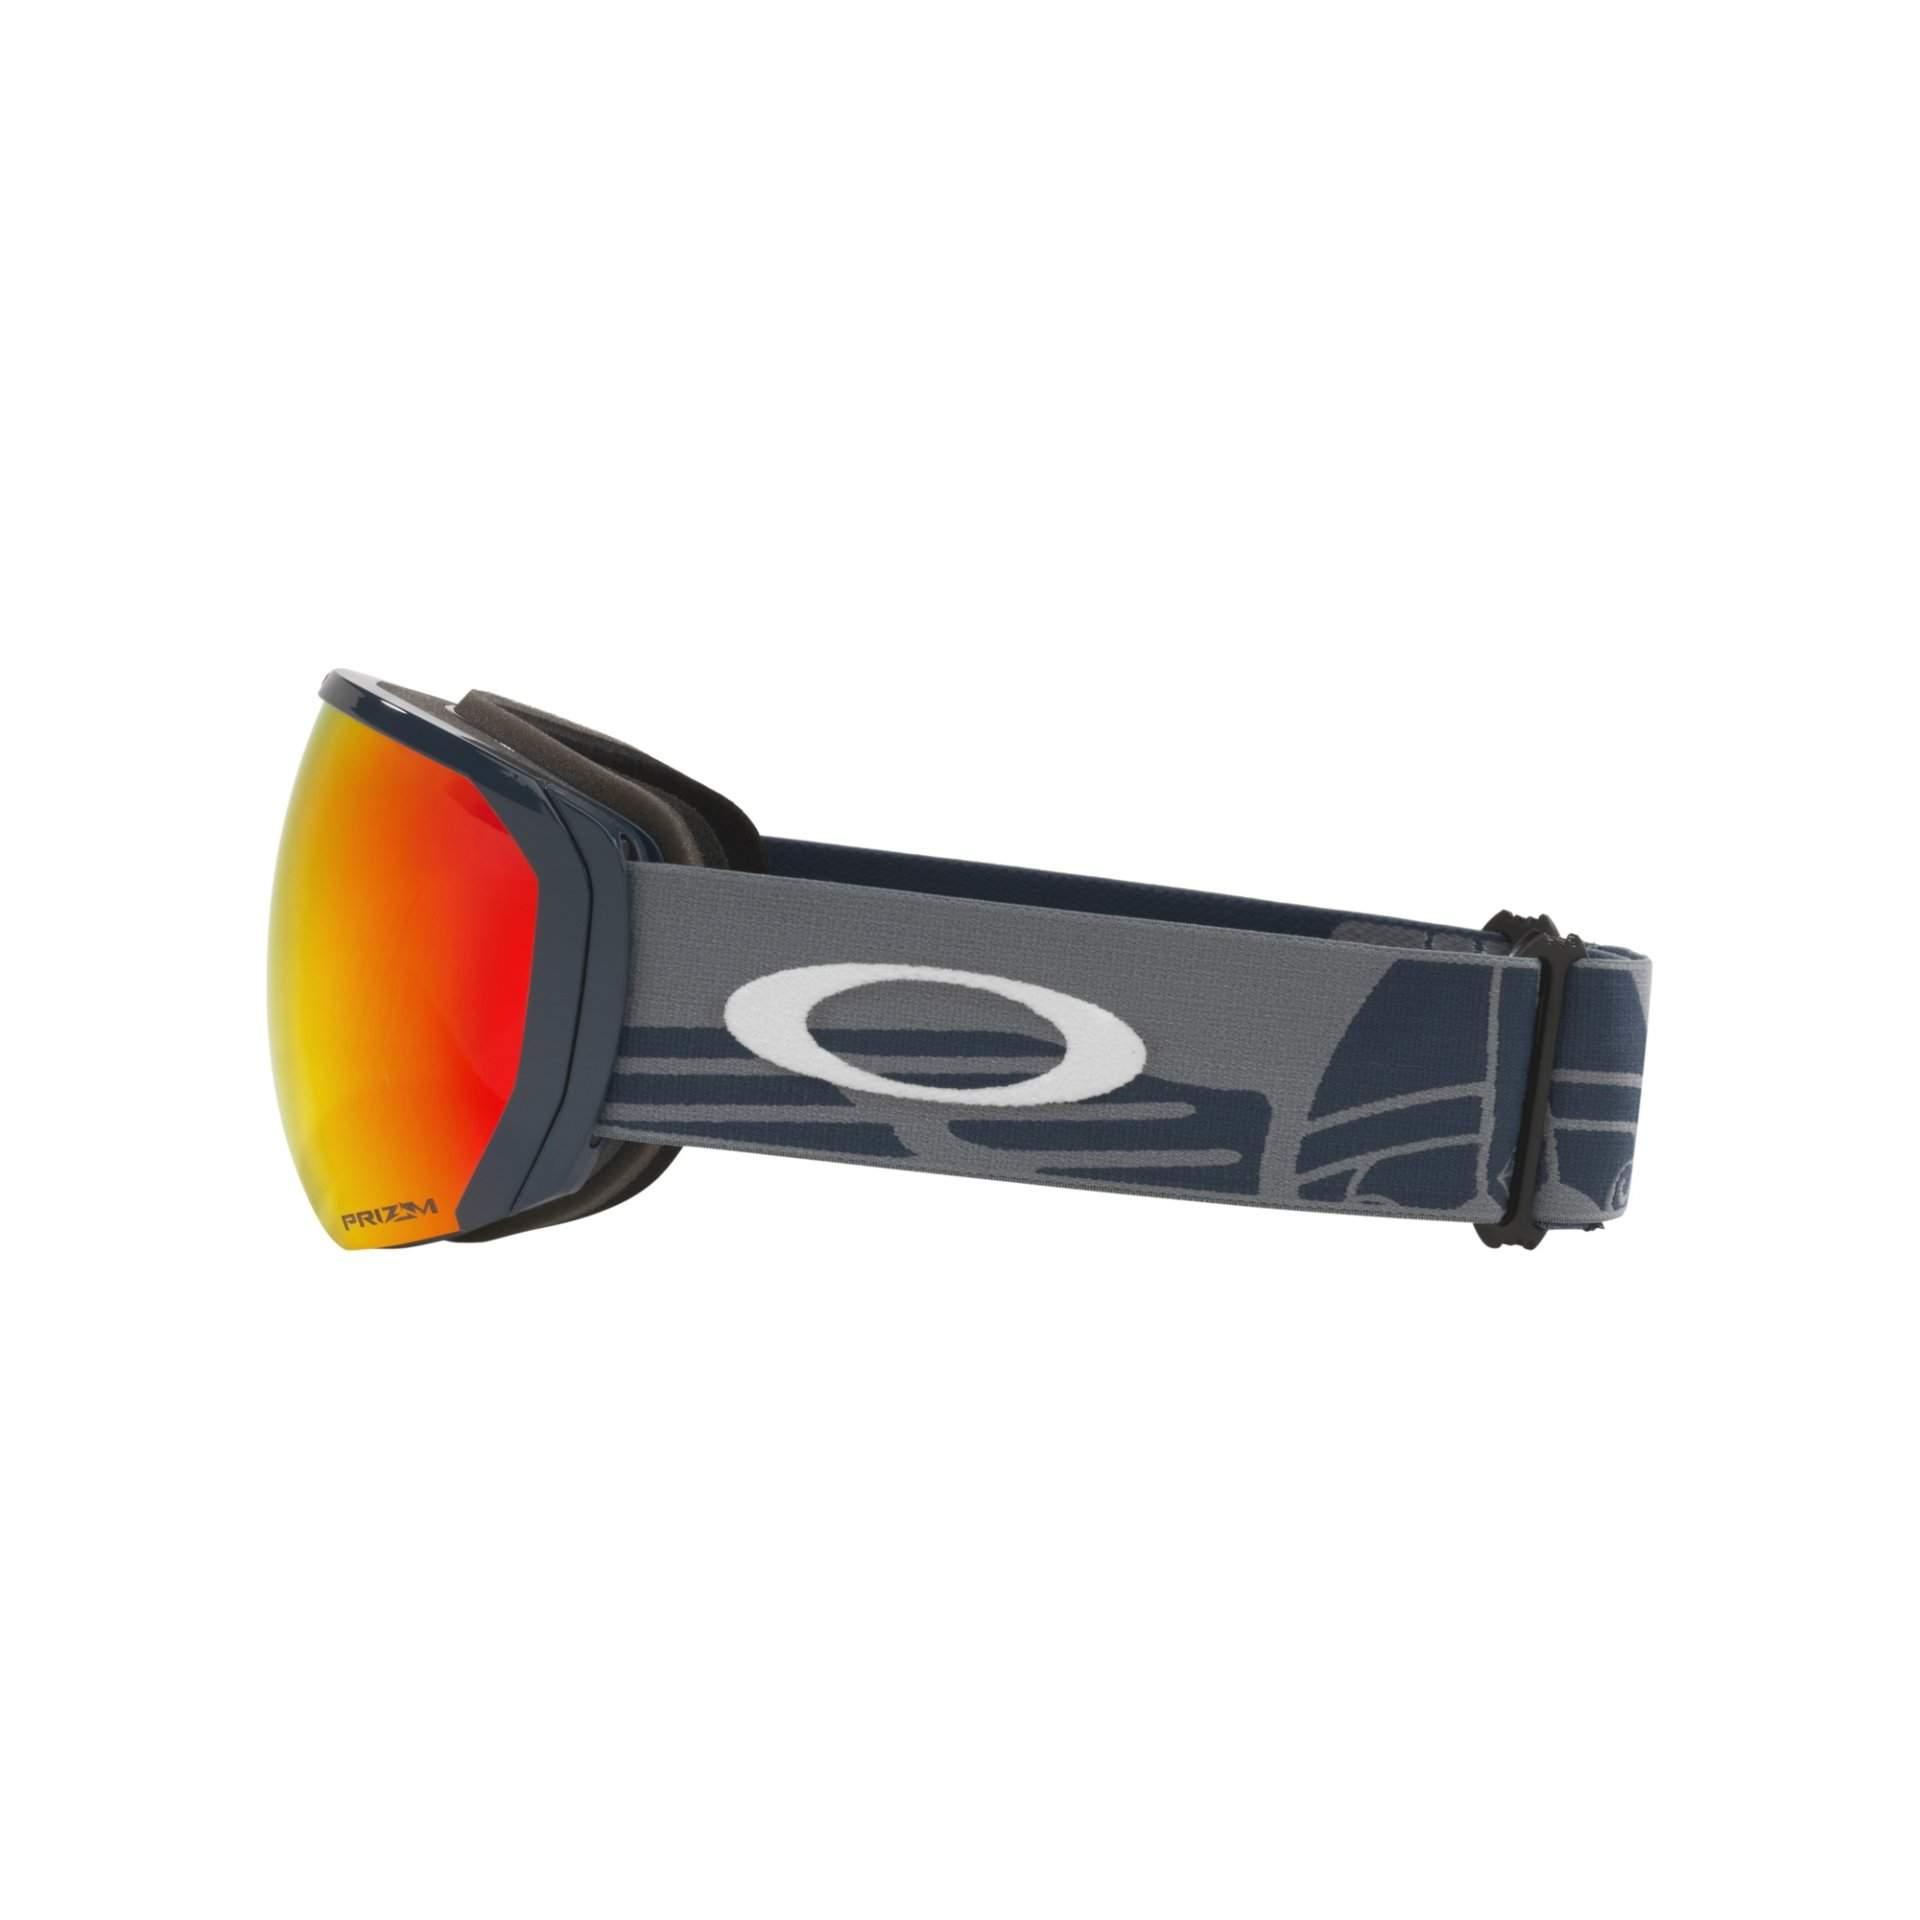 GOGLE OAKLEY FLIGHT PATH XL OO7110 46 VIKING PRIZM SNOW TORCH IRIDIUM Z BOKU